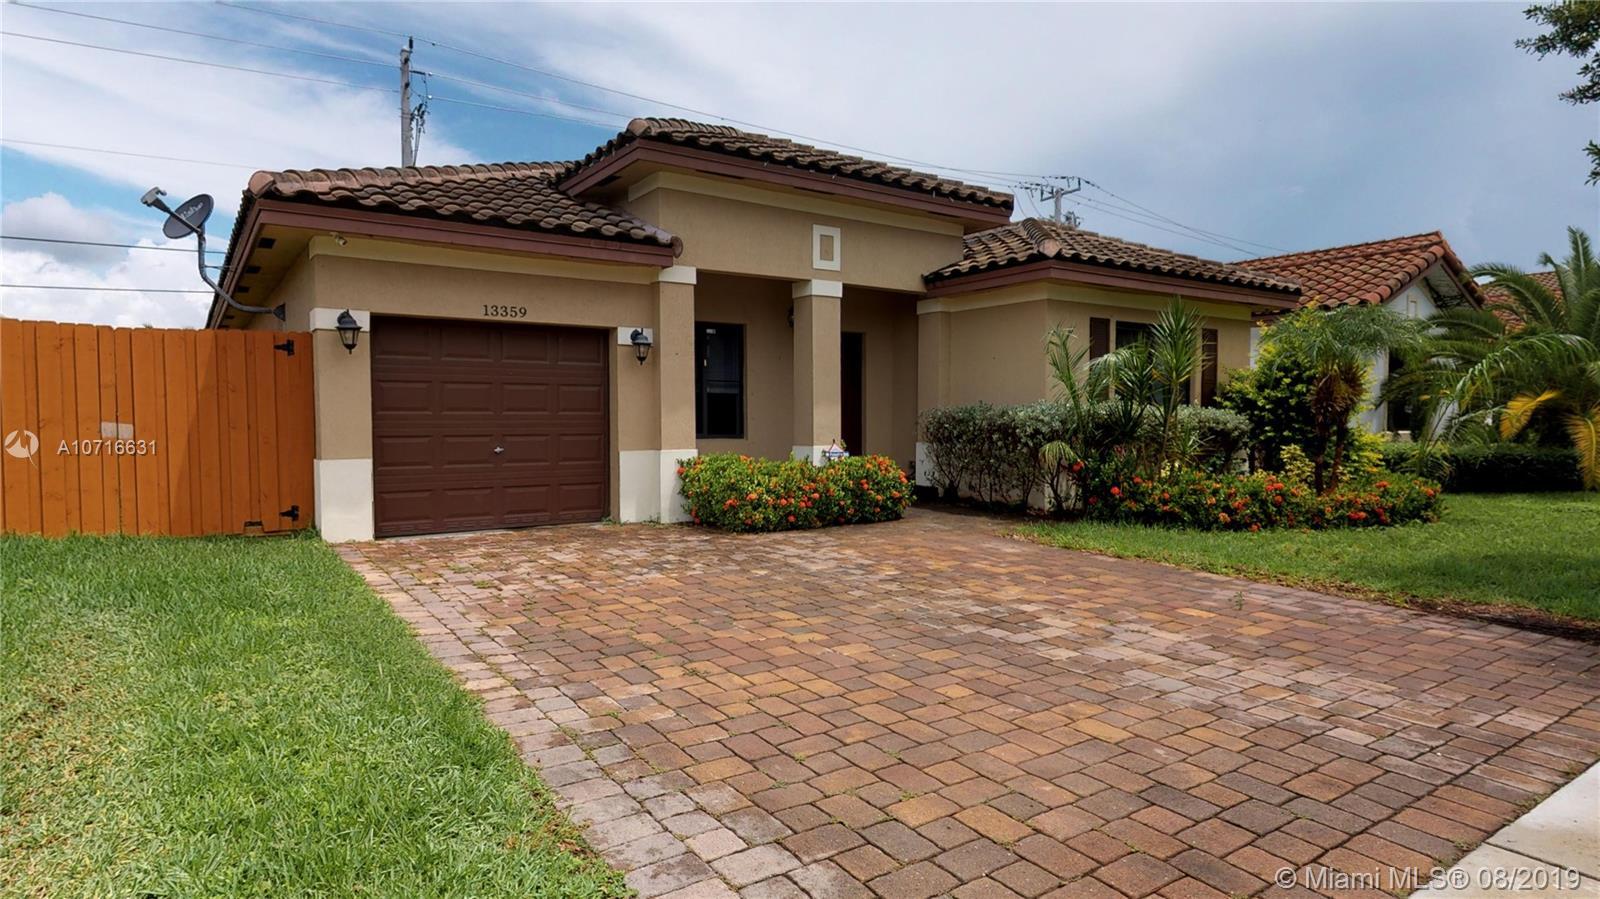 13359 SW 268th Ter, Homestead, Florida